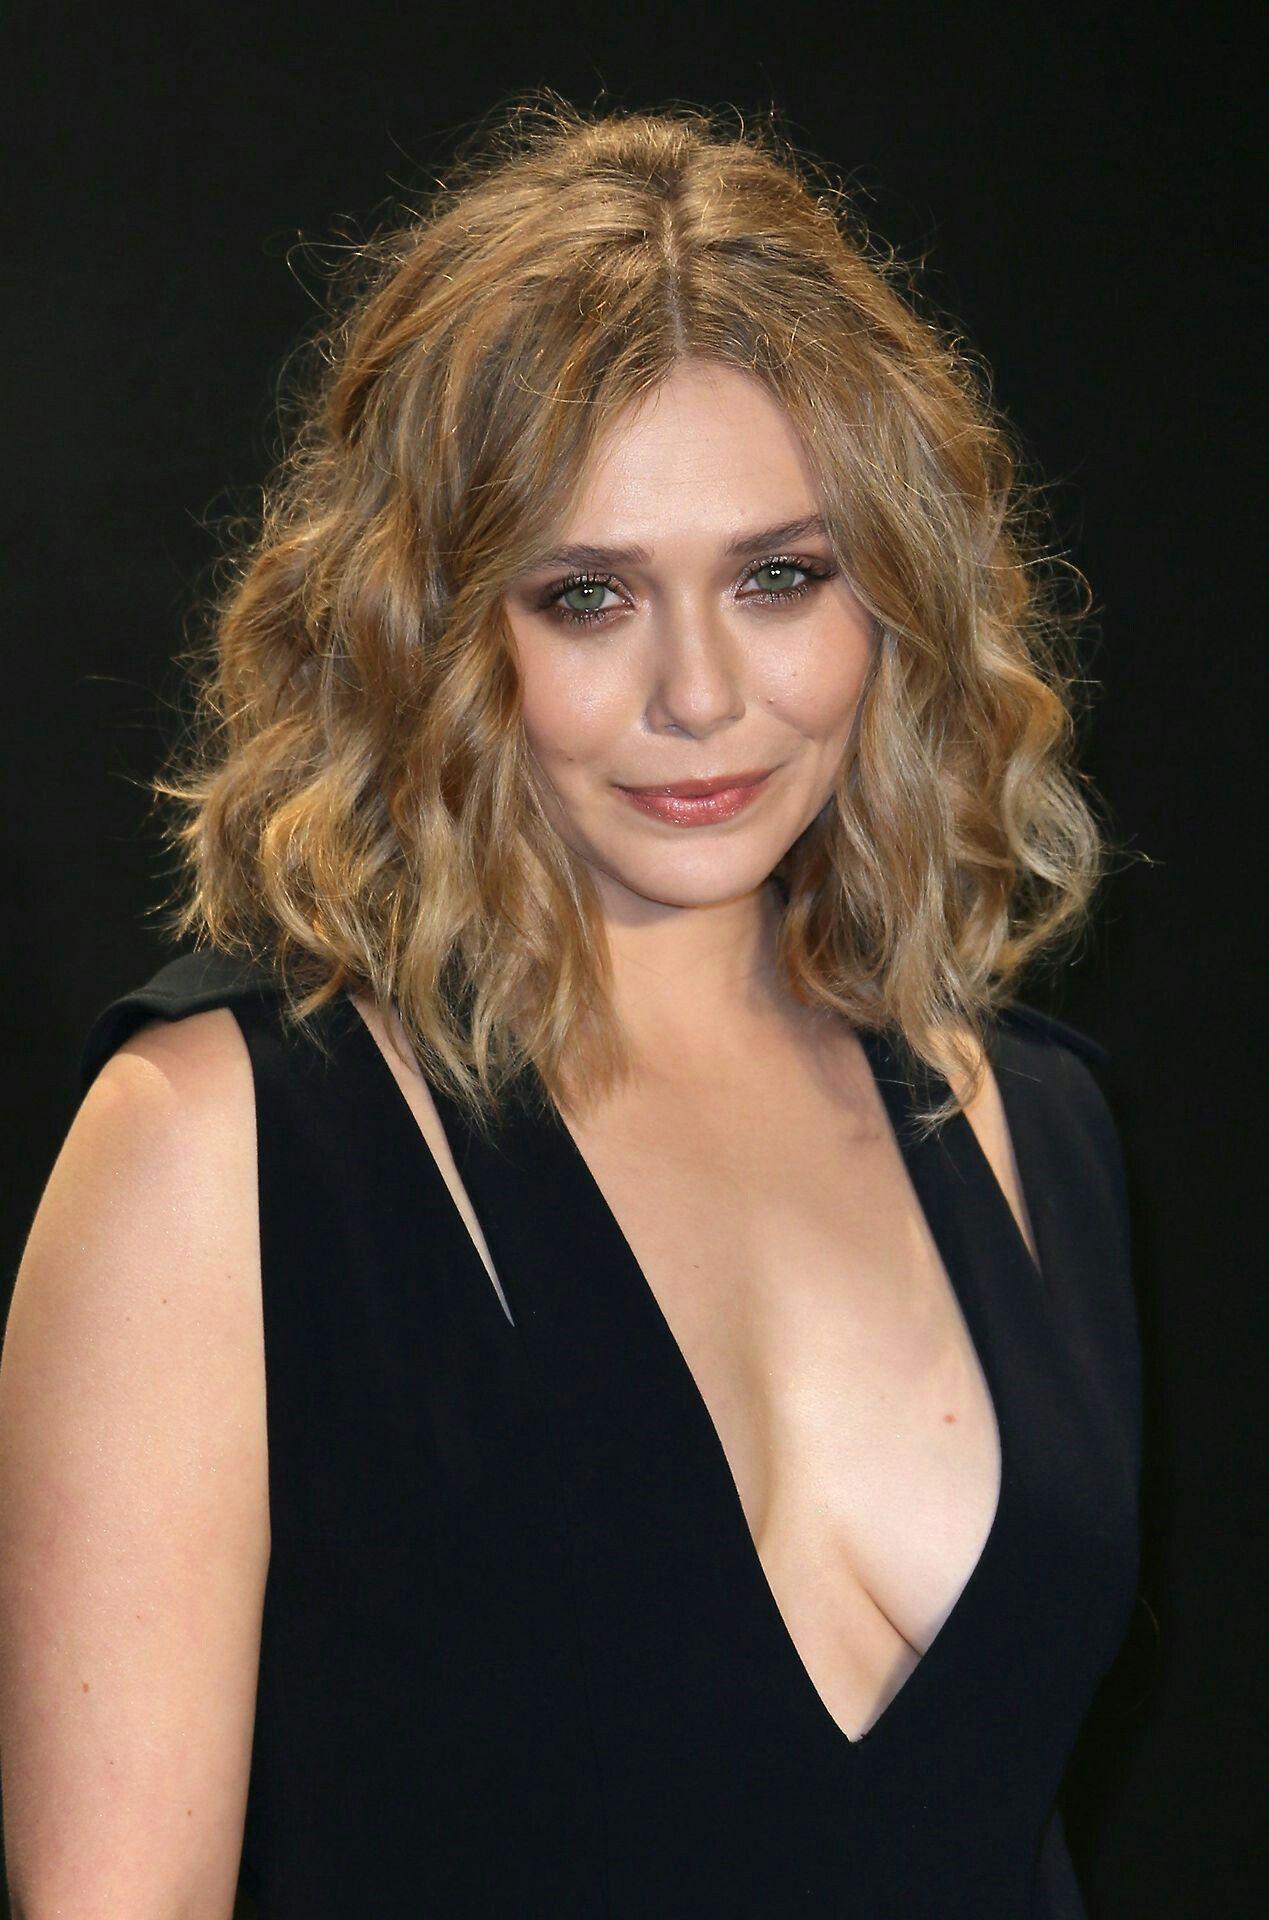 Elizabeth olsen elizabeth olsen - Scarlet witch boobs ...